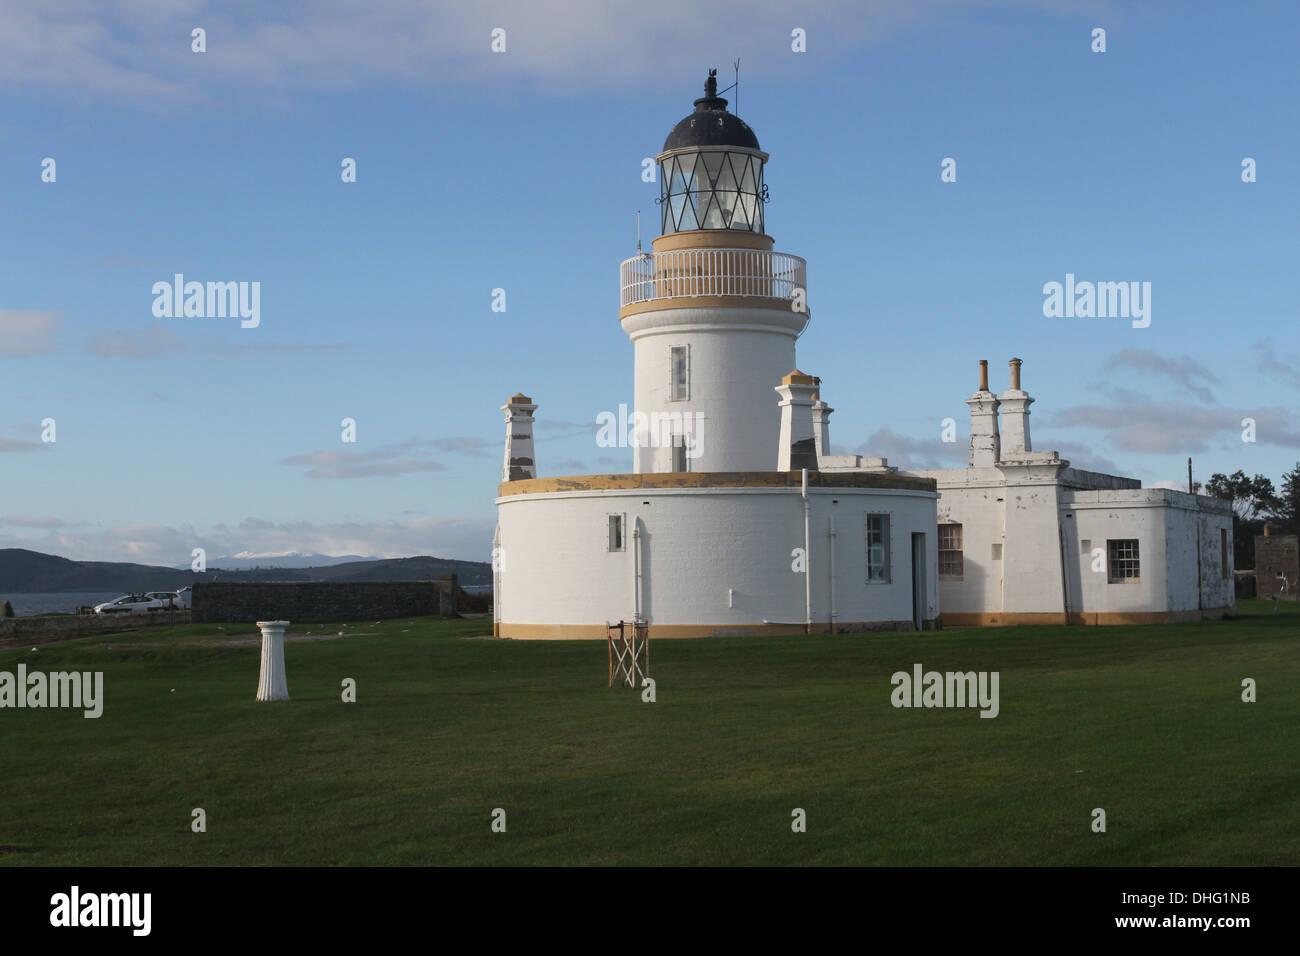 Lighthouse Chanonry point Scotland November 2013 - Stock Image